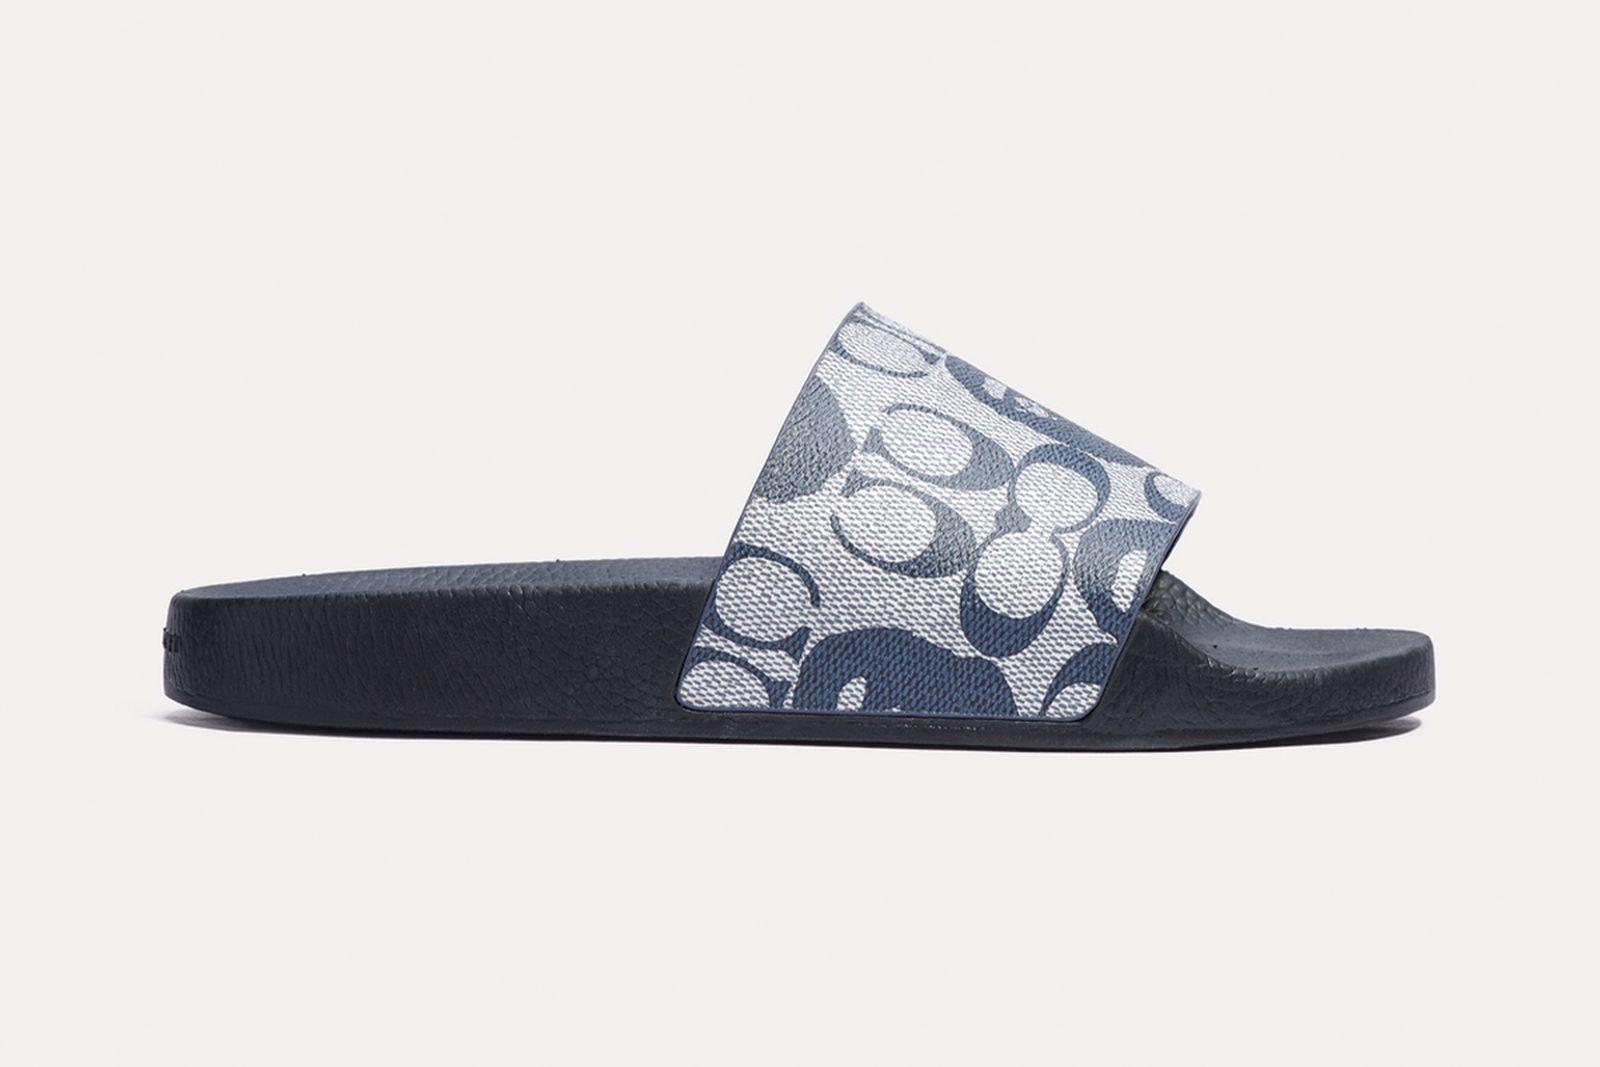 coach-bape-sta-sneaker-denim-collaboration-21